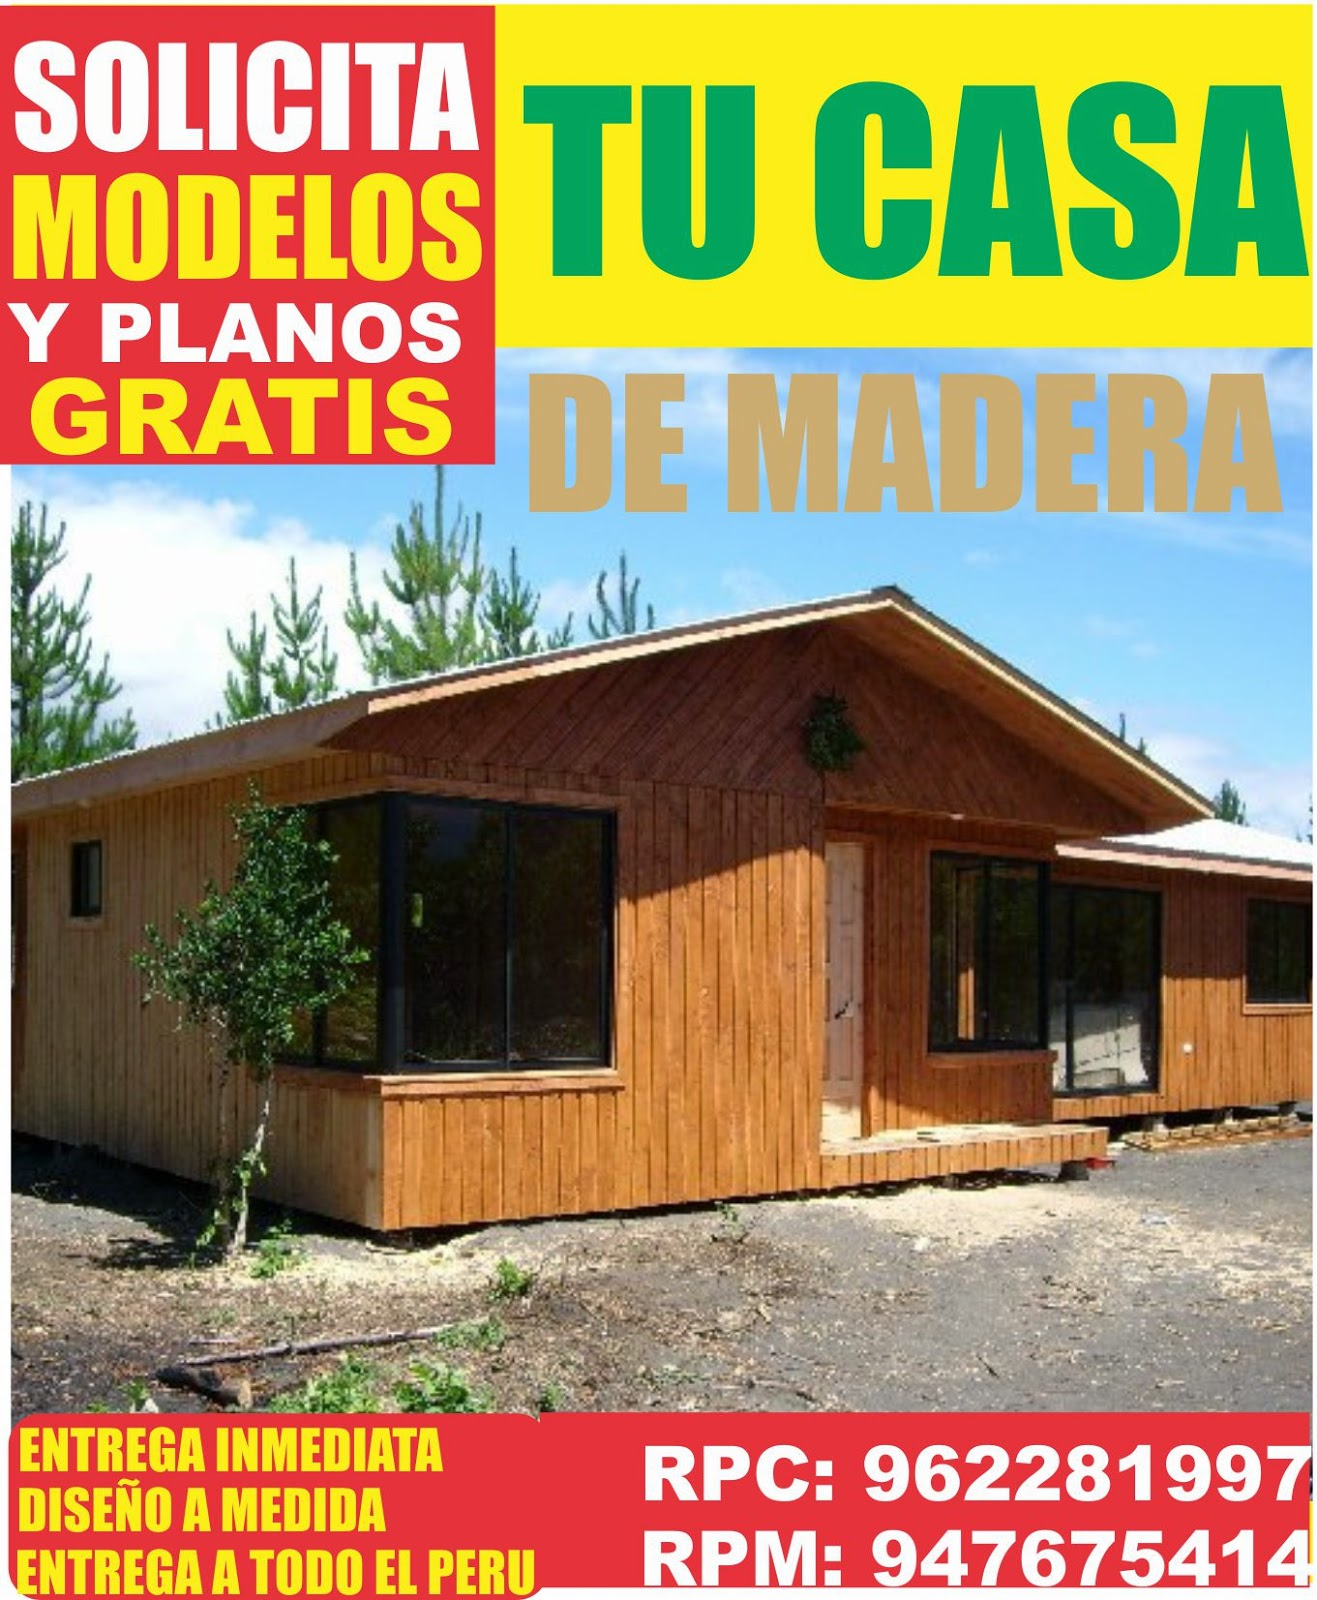 Casas prefabricadas de madera modelos dise o moderno peru - Modelos de casas prefabricadas economicas ...